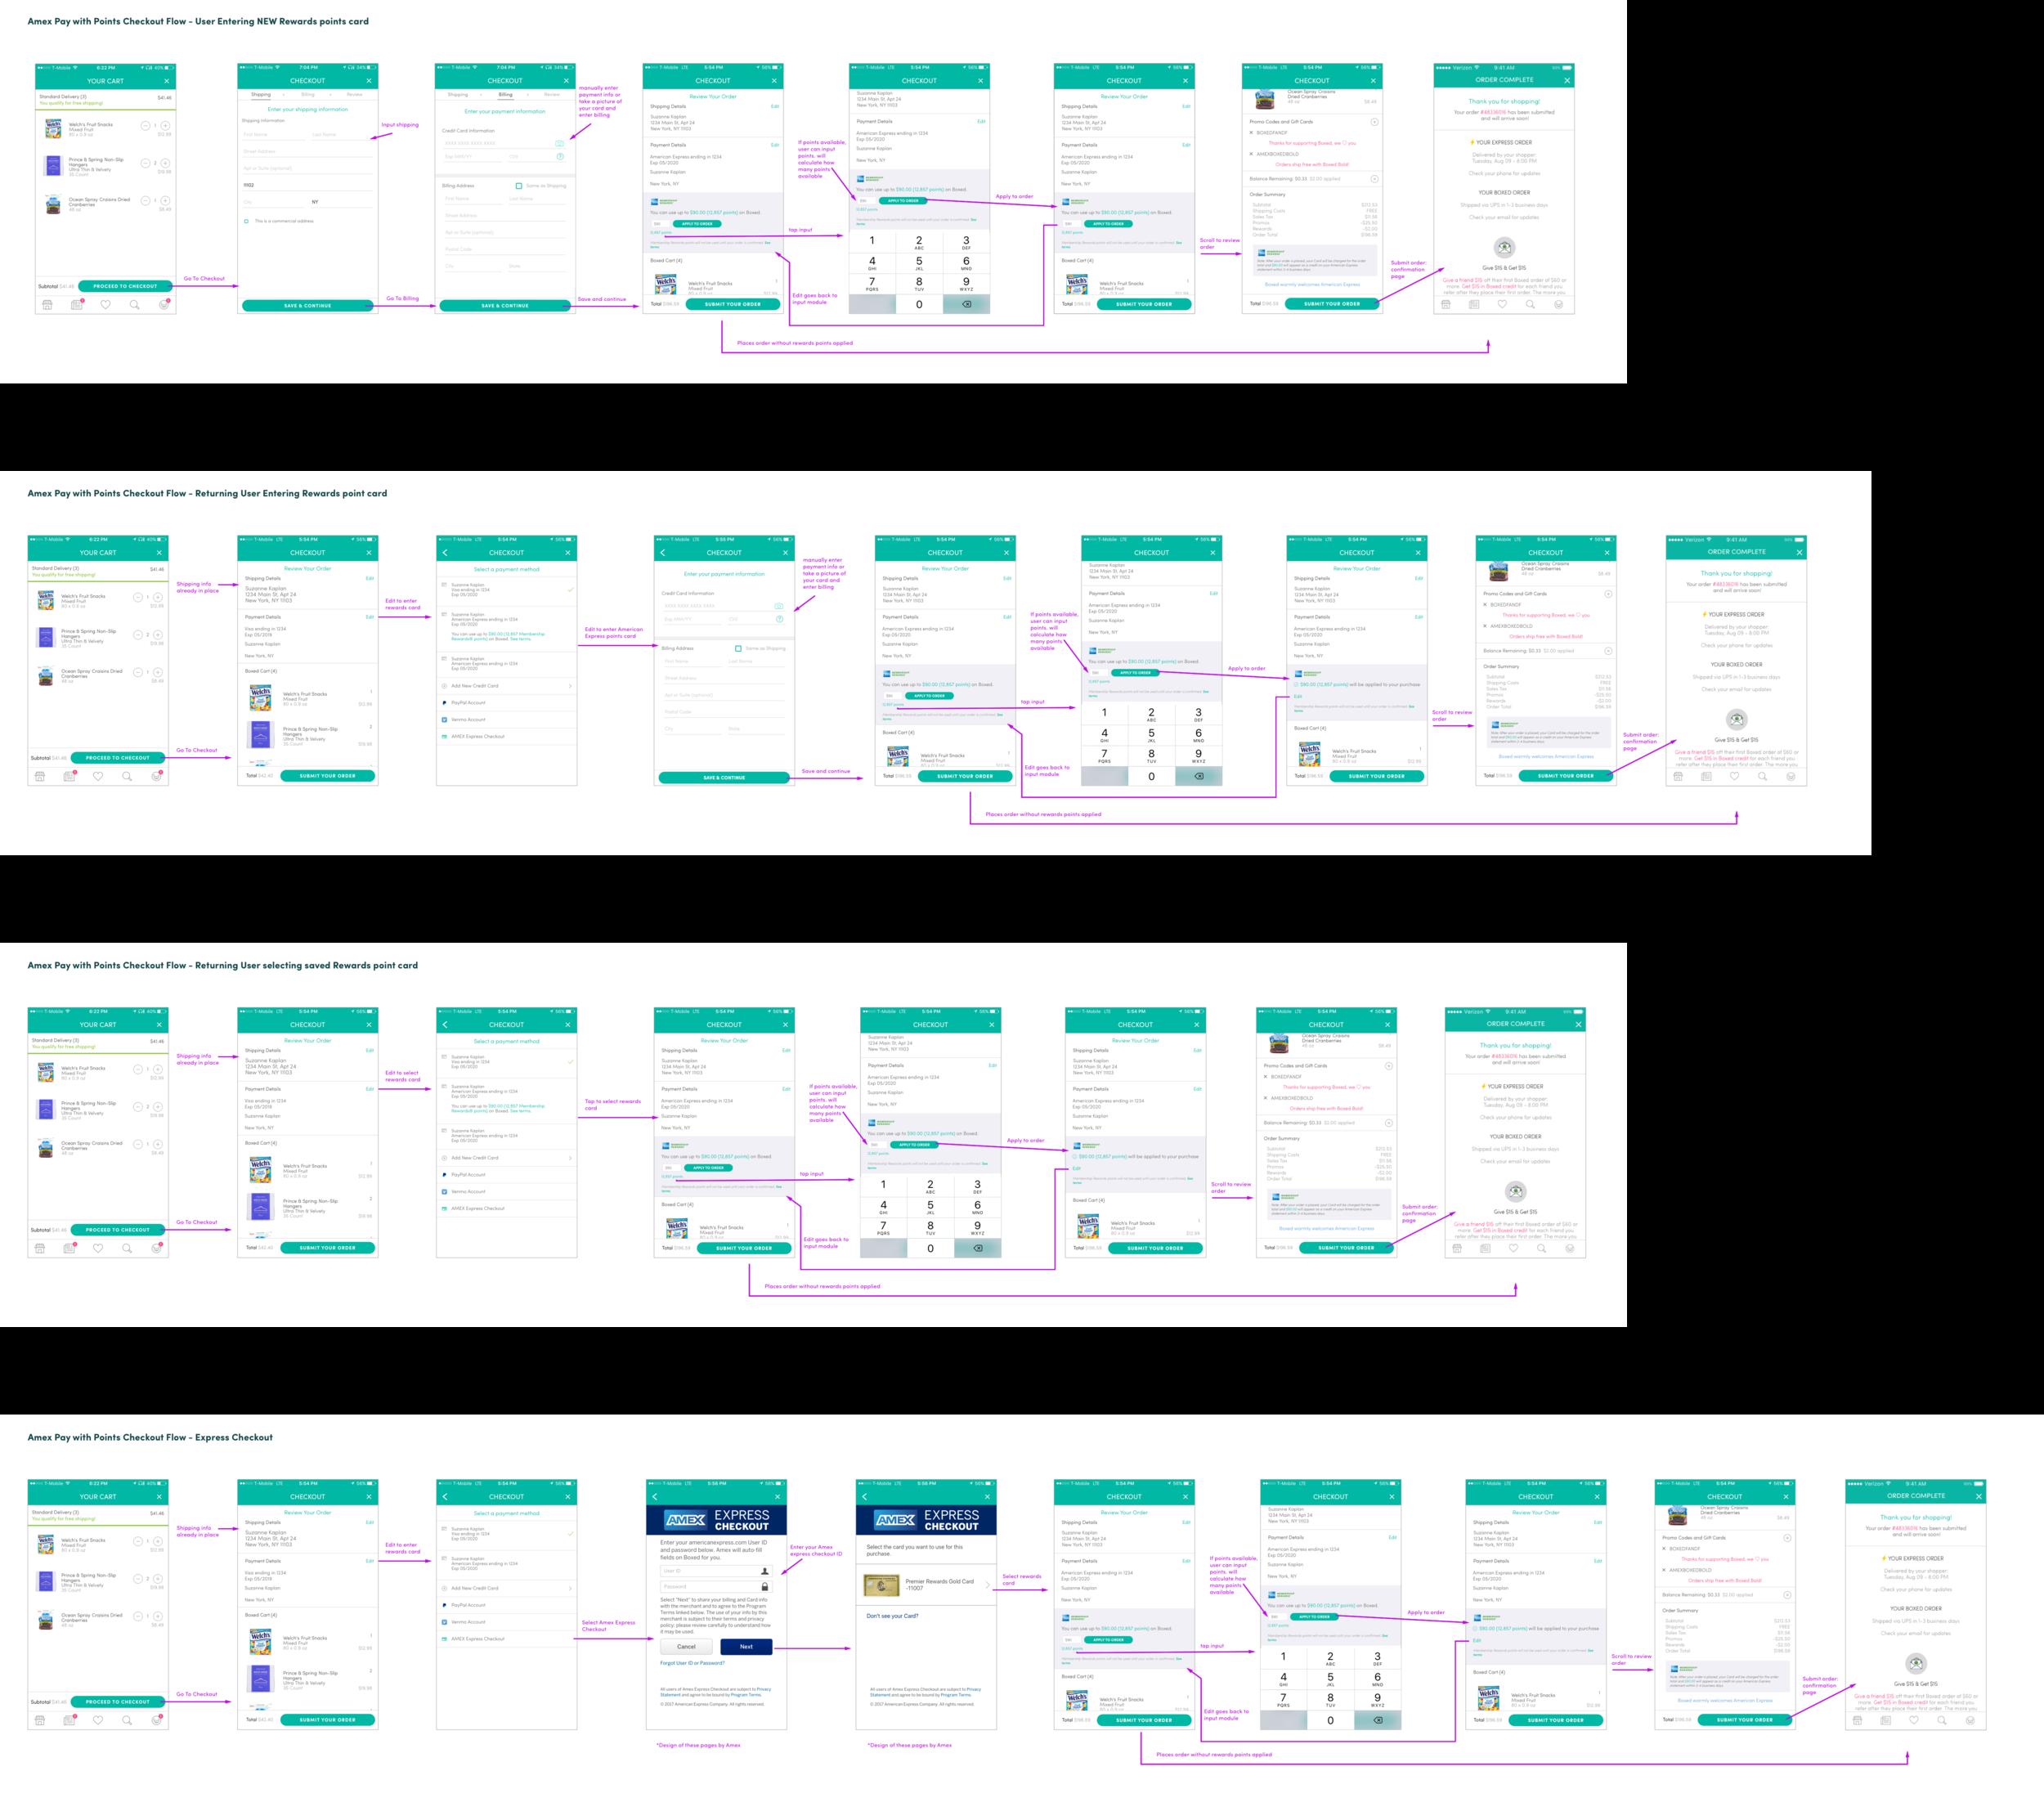 Mobile App (iOS) Flows